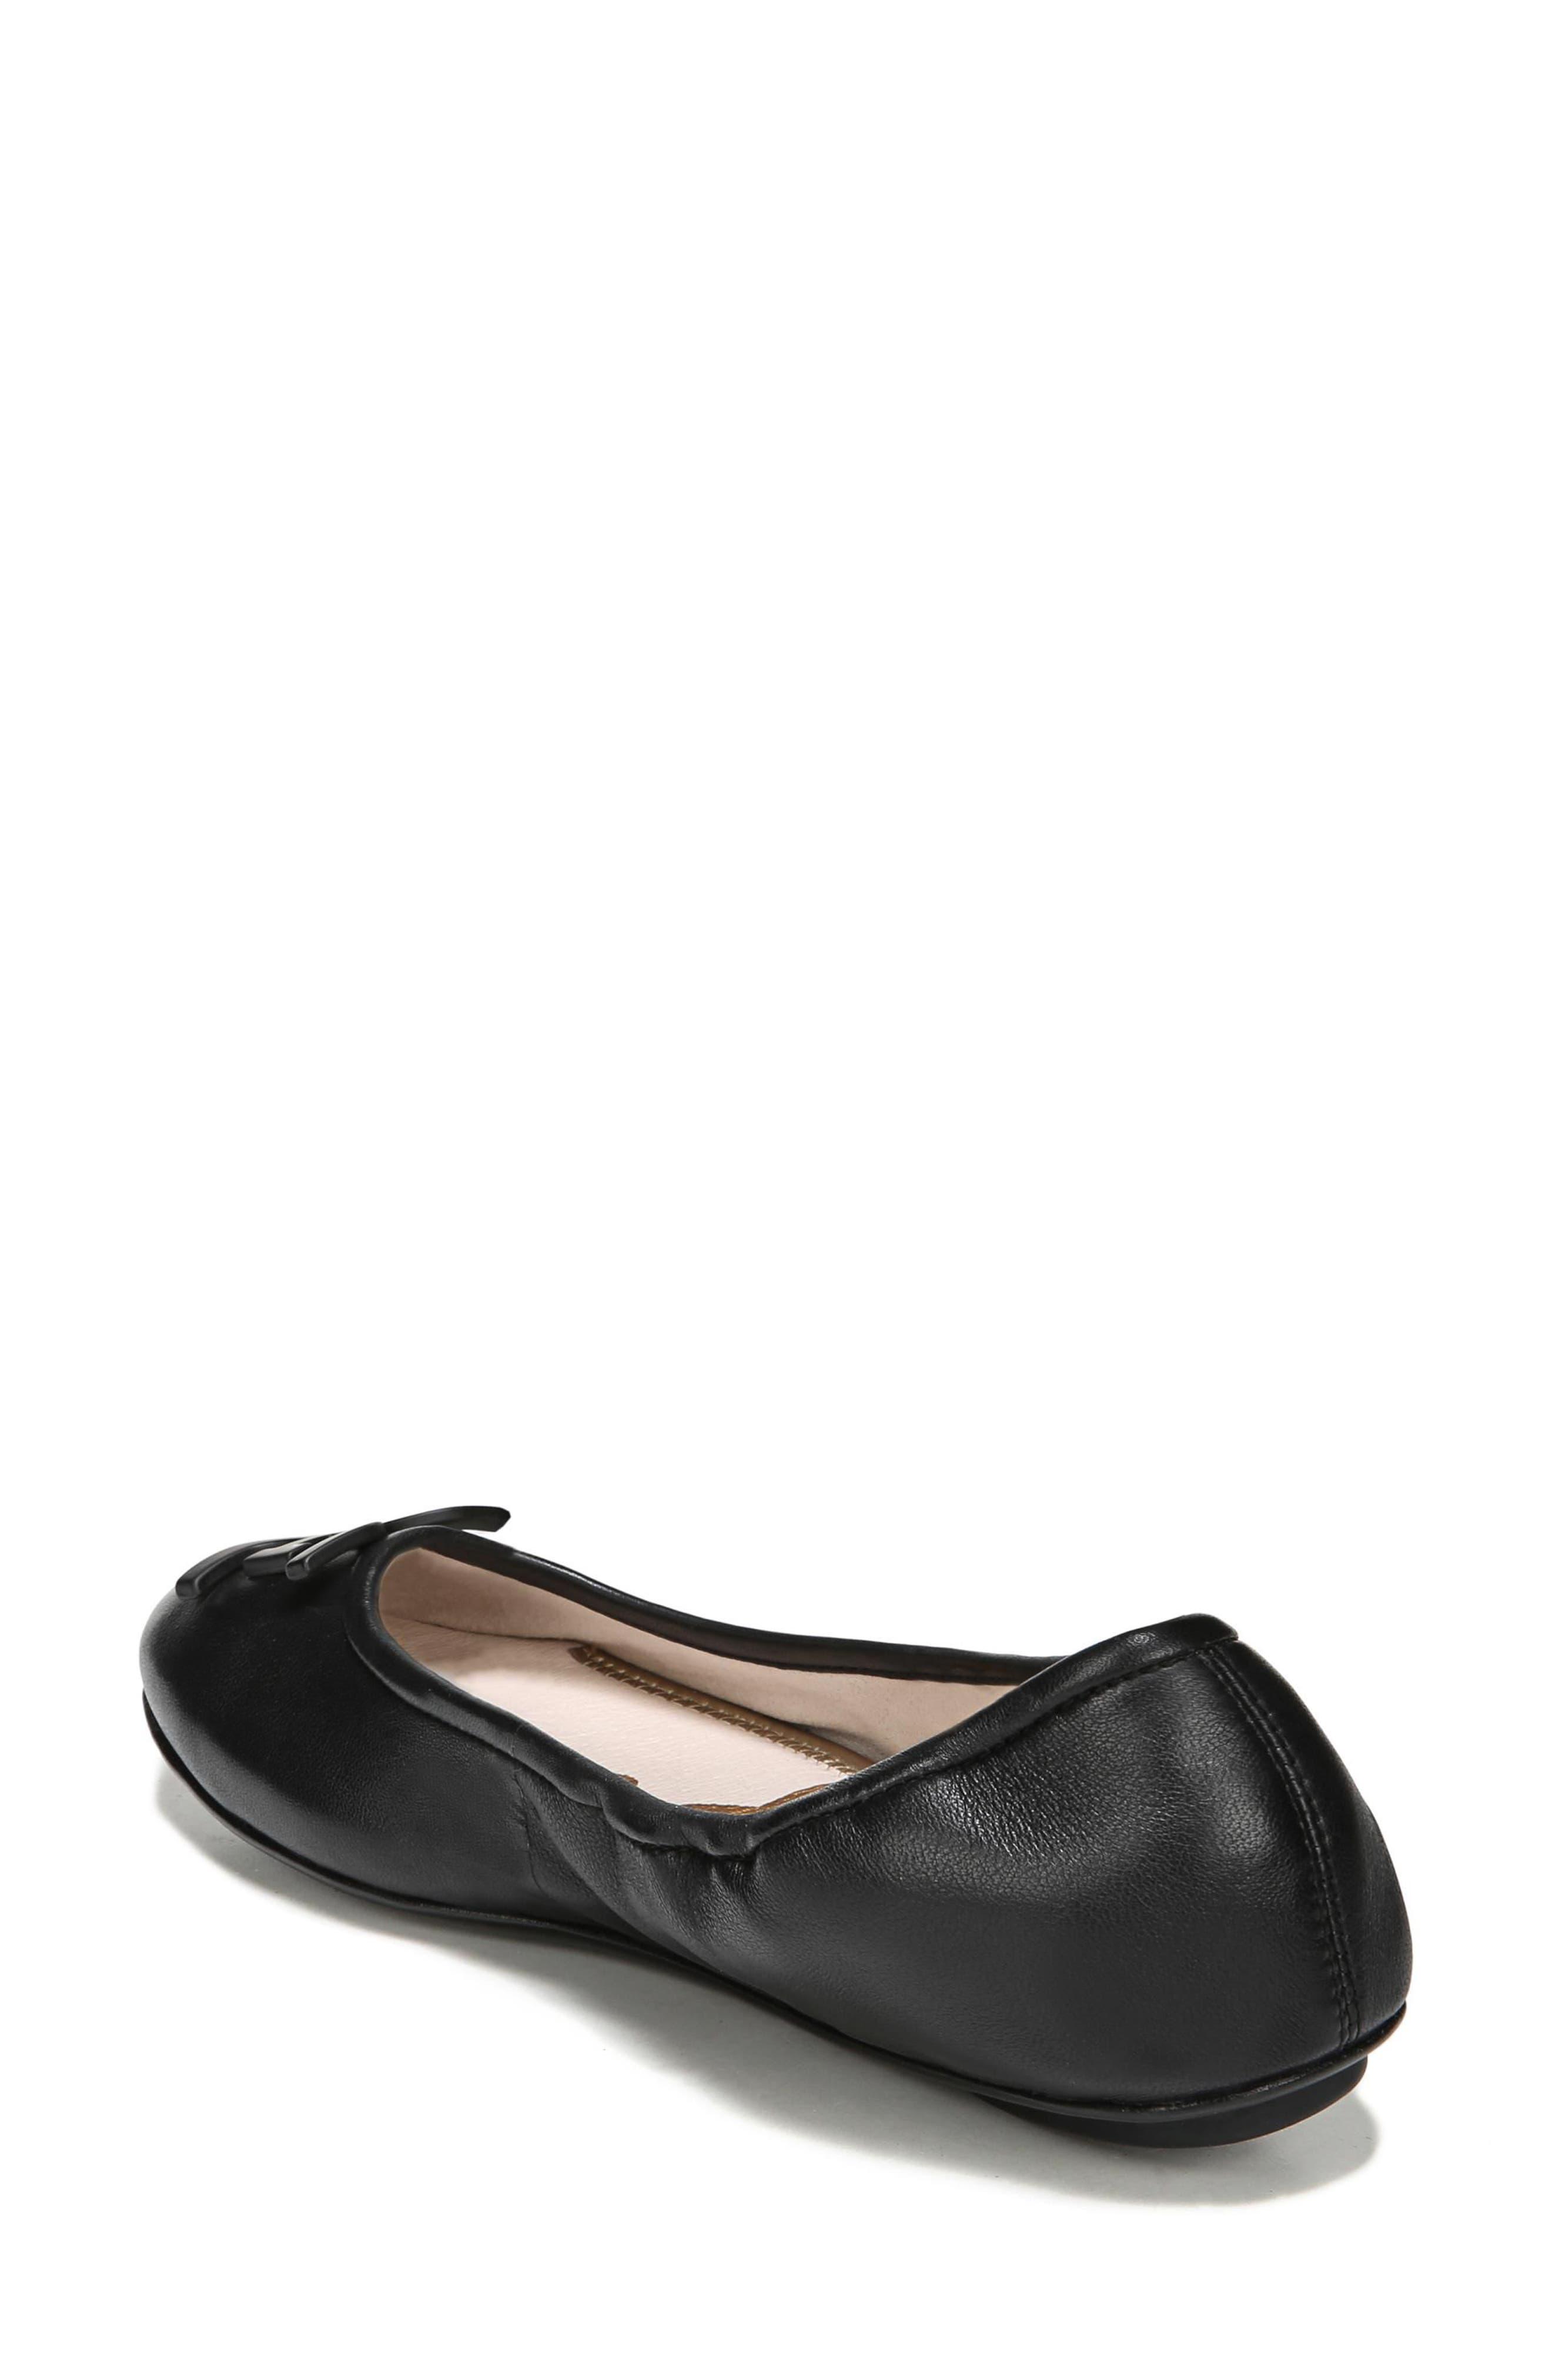 Florence Ballet Flat,                             Alternate thumbnail 2, color,                             Black Leather